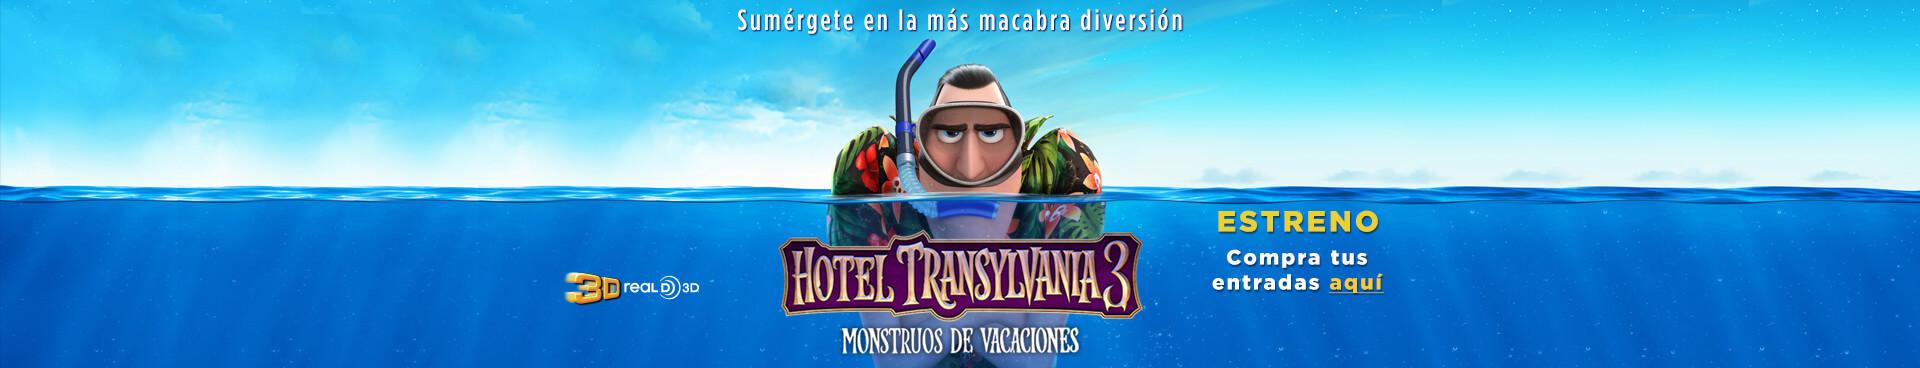 Estreno Hotel Transylvania 3